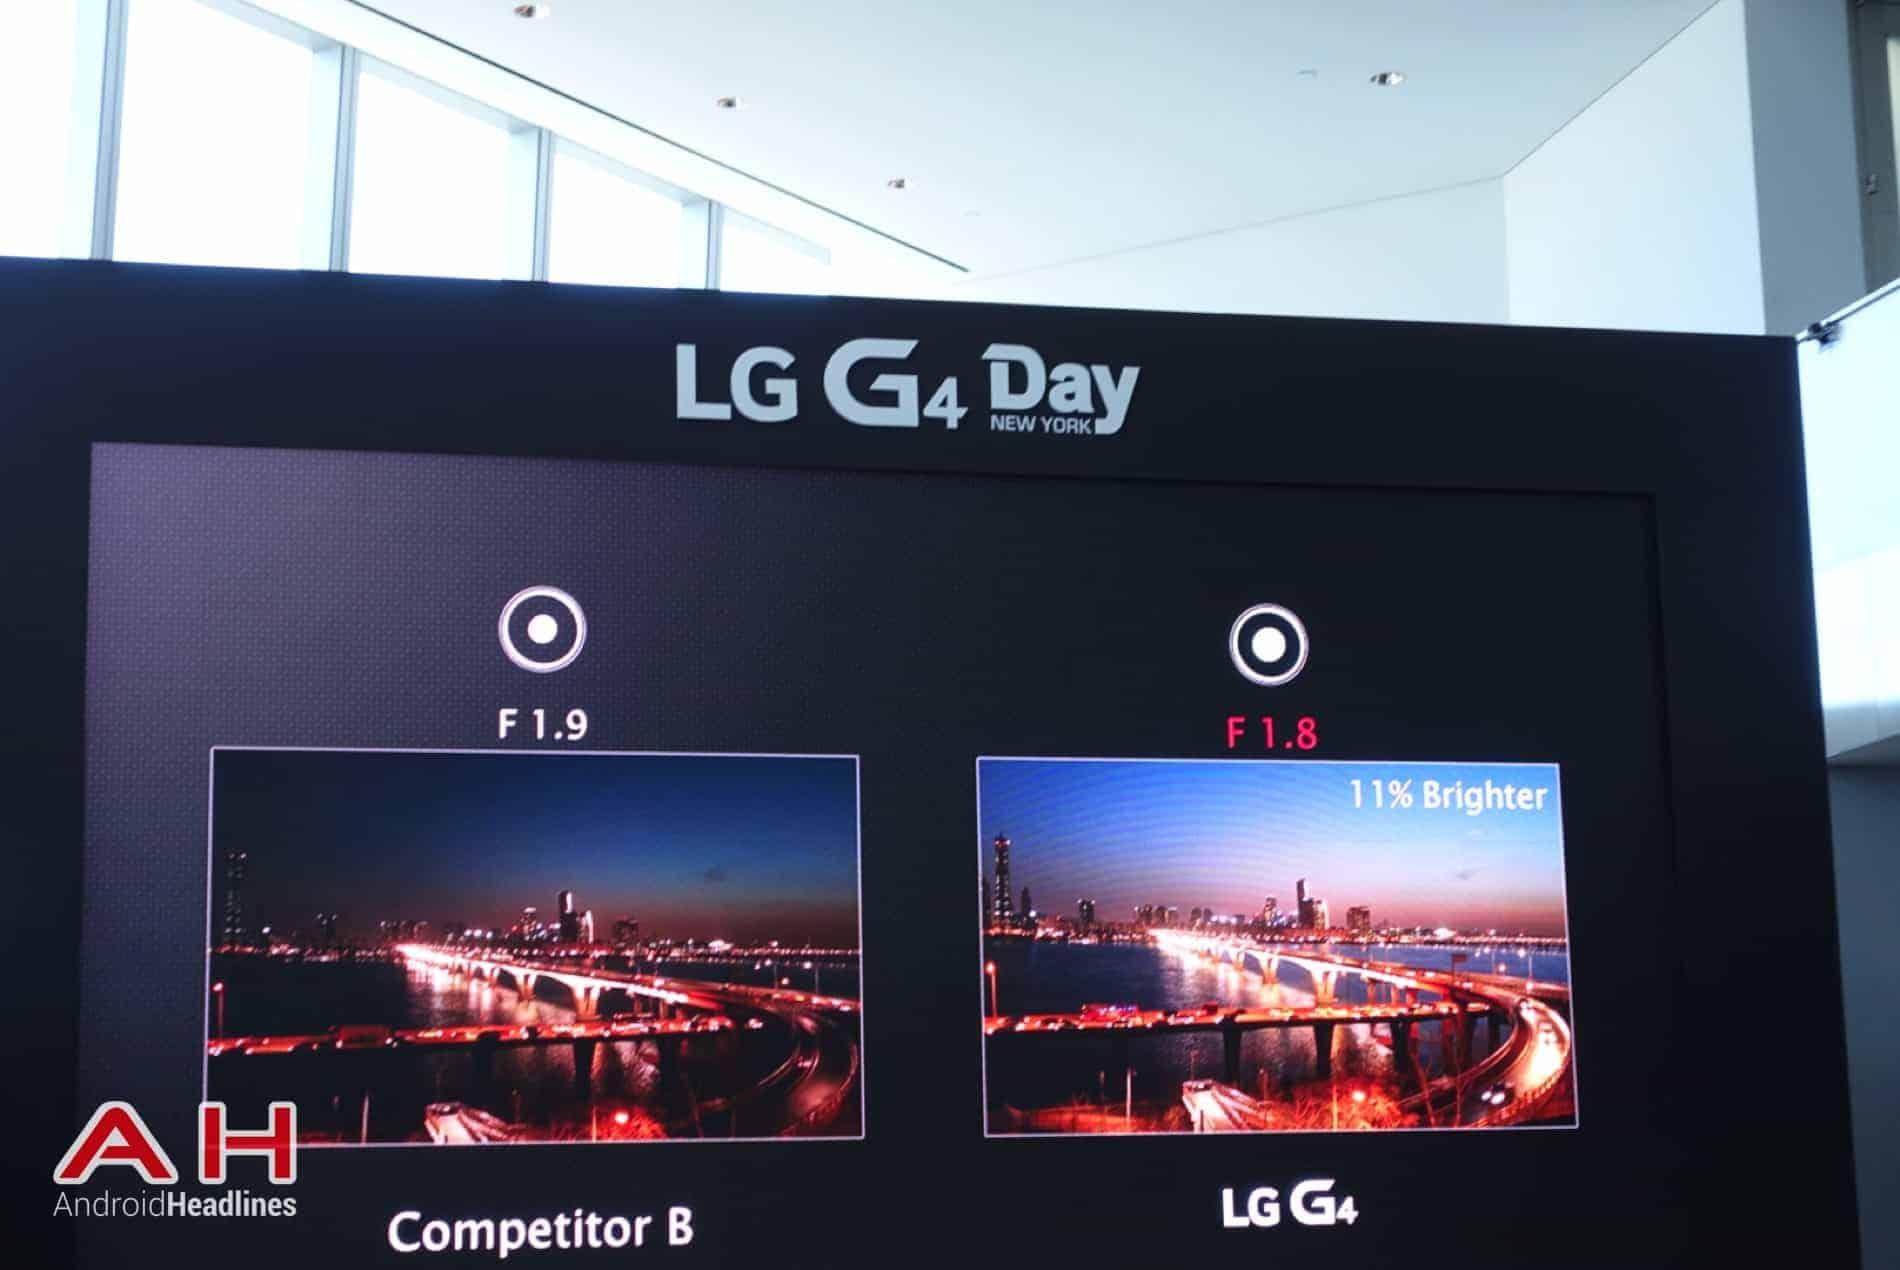 LG G4 Day AH 03 101